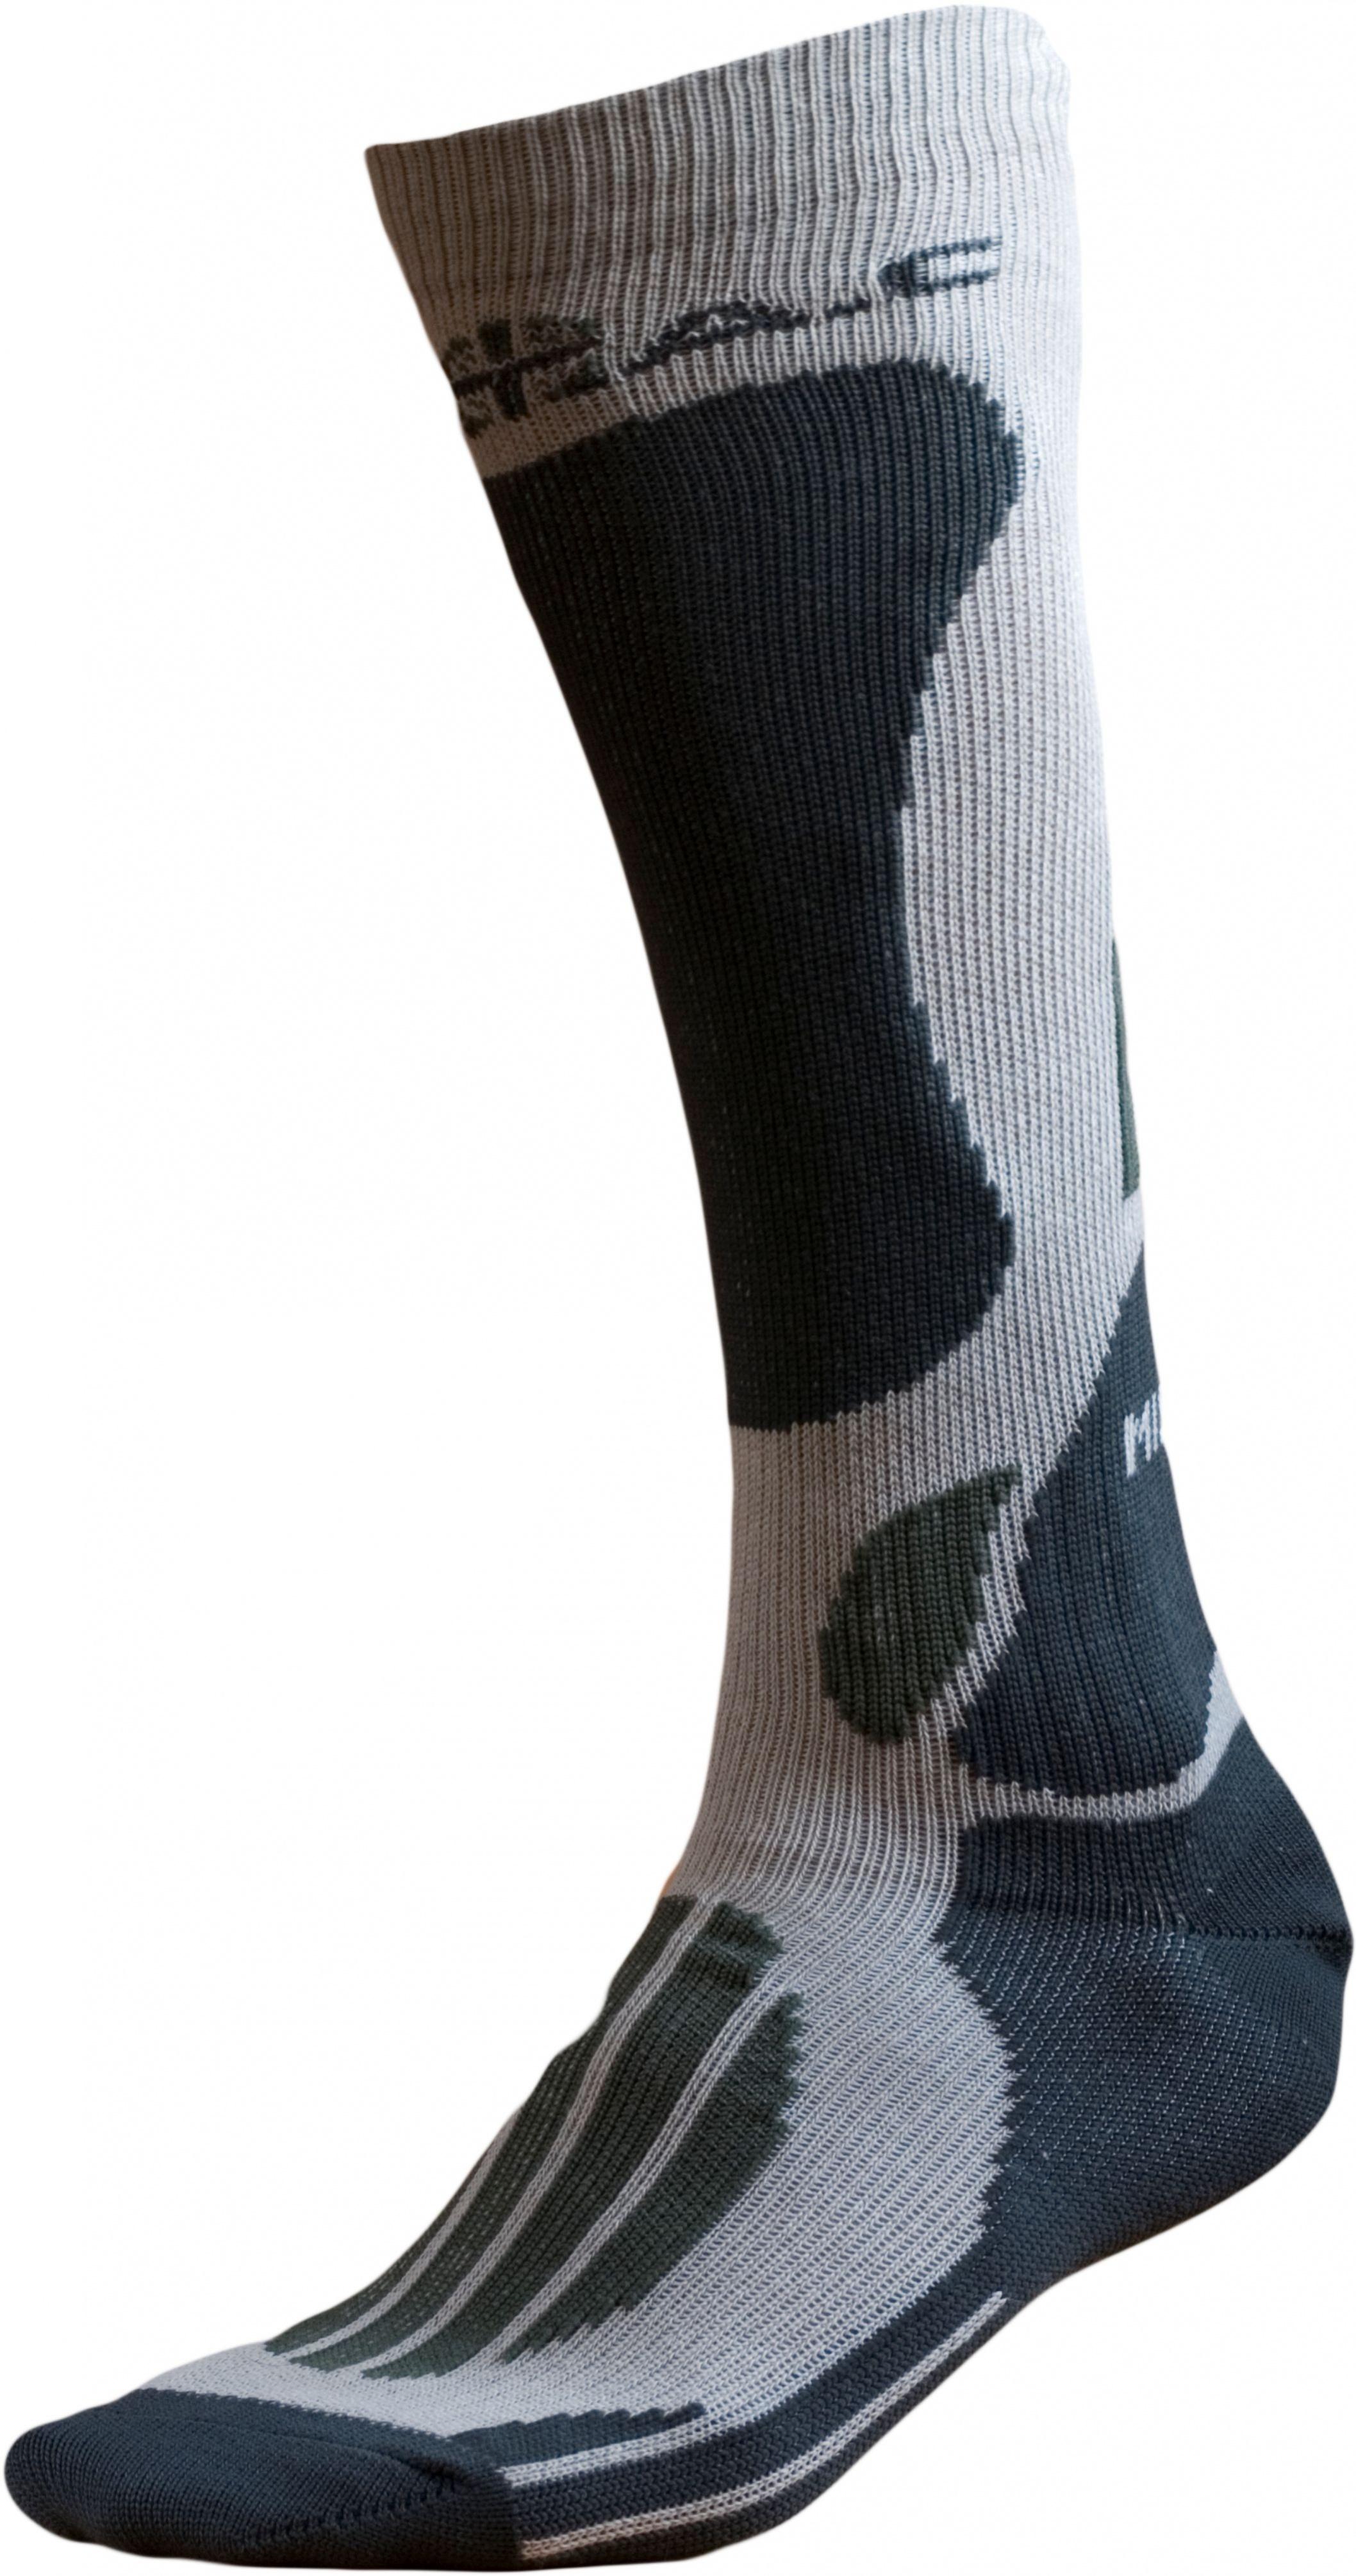 Ponožky BATAC Mission MI13 vel. 39-41 - green